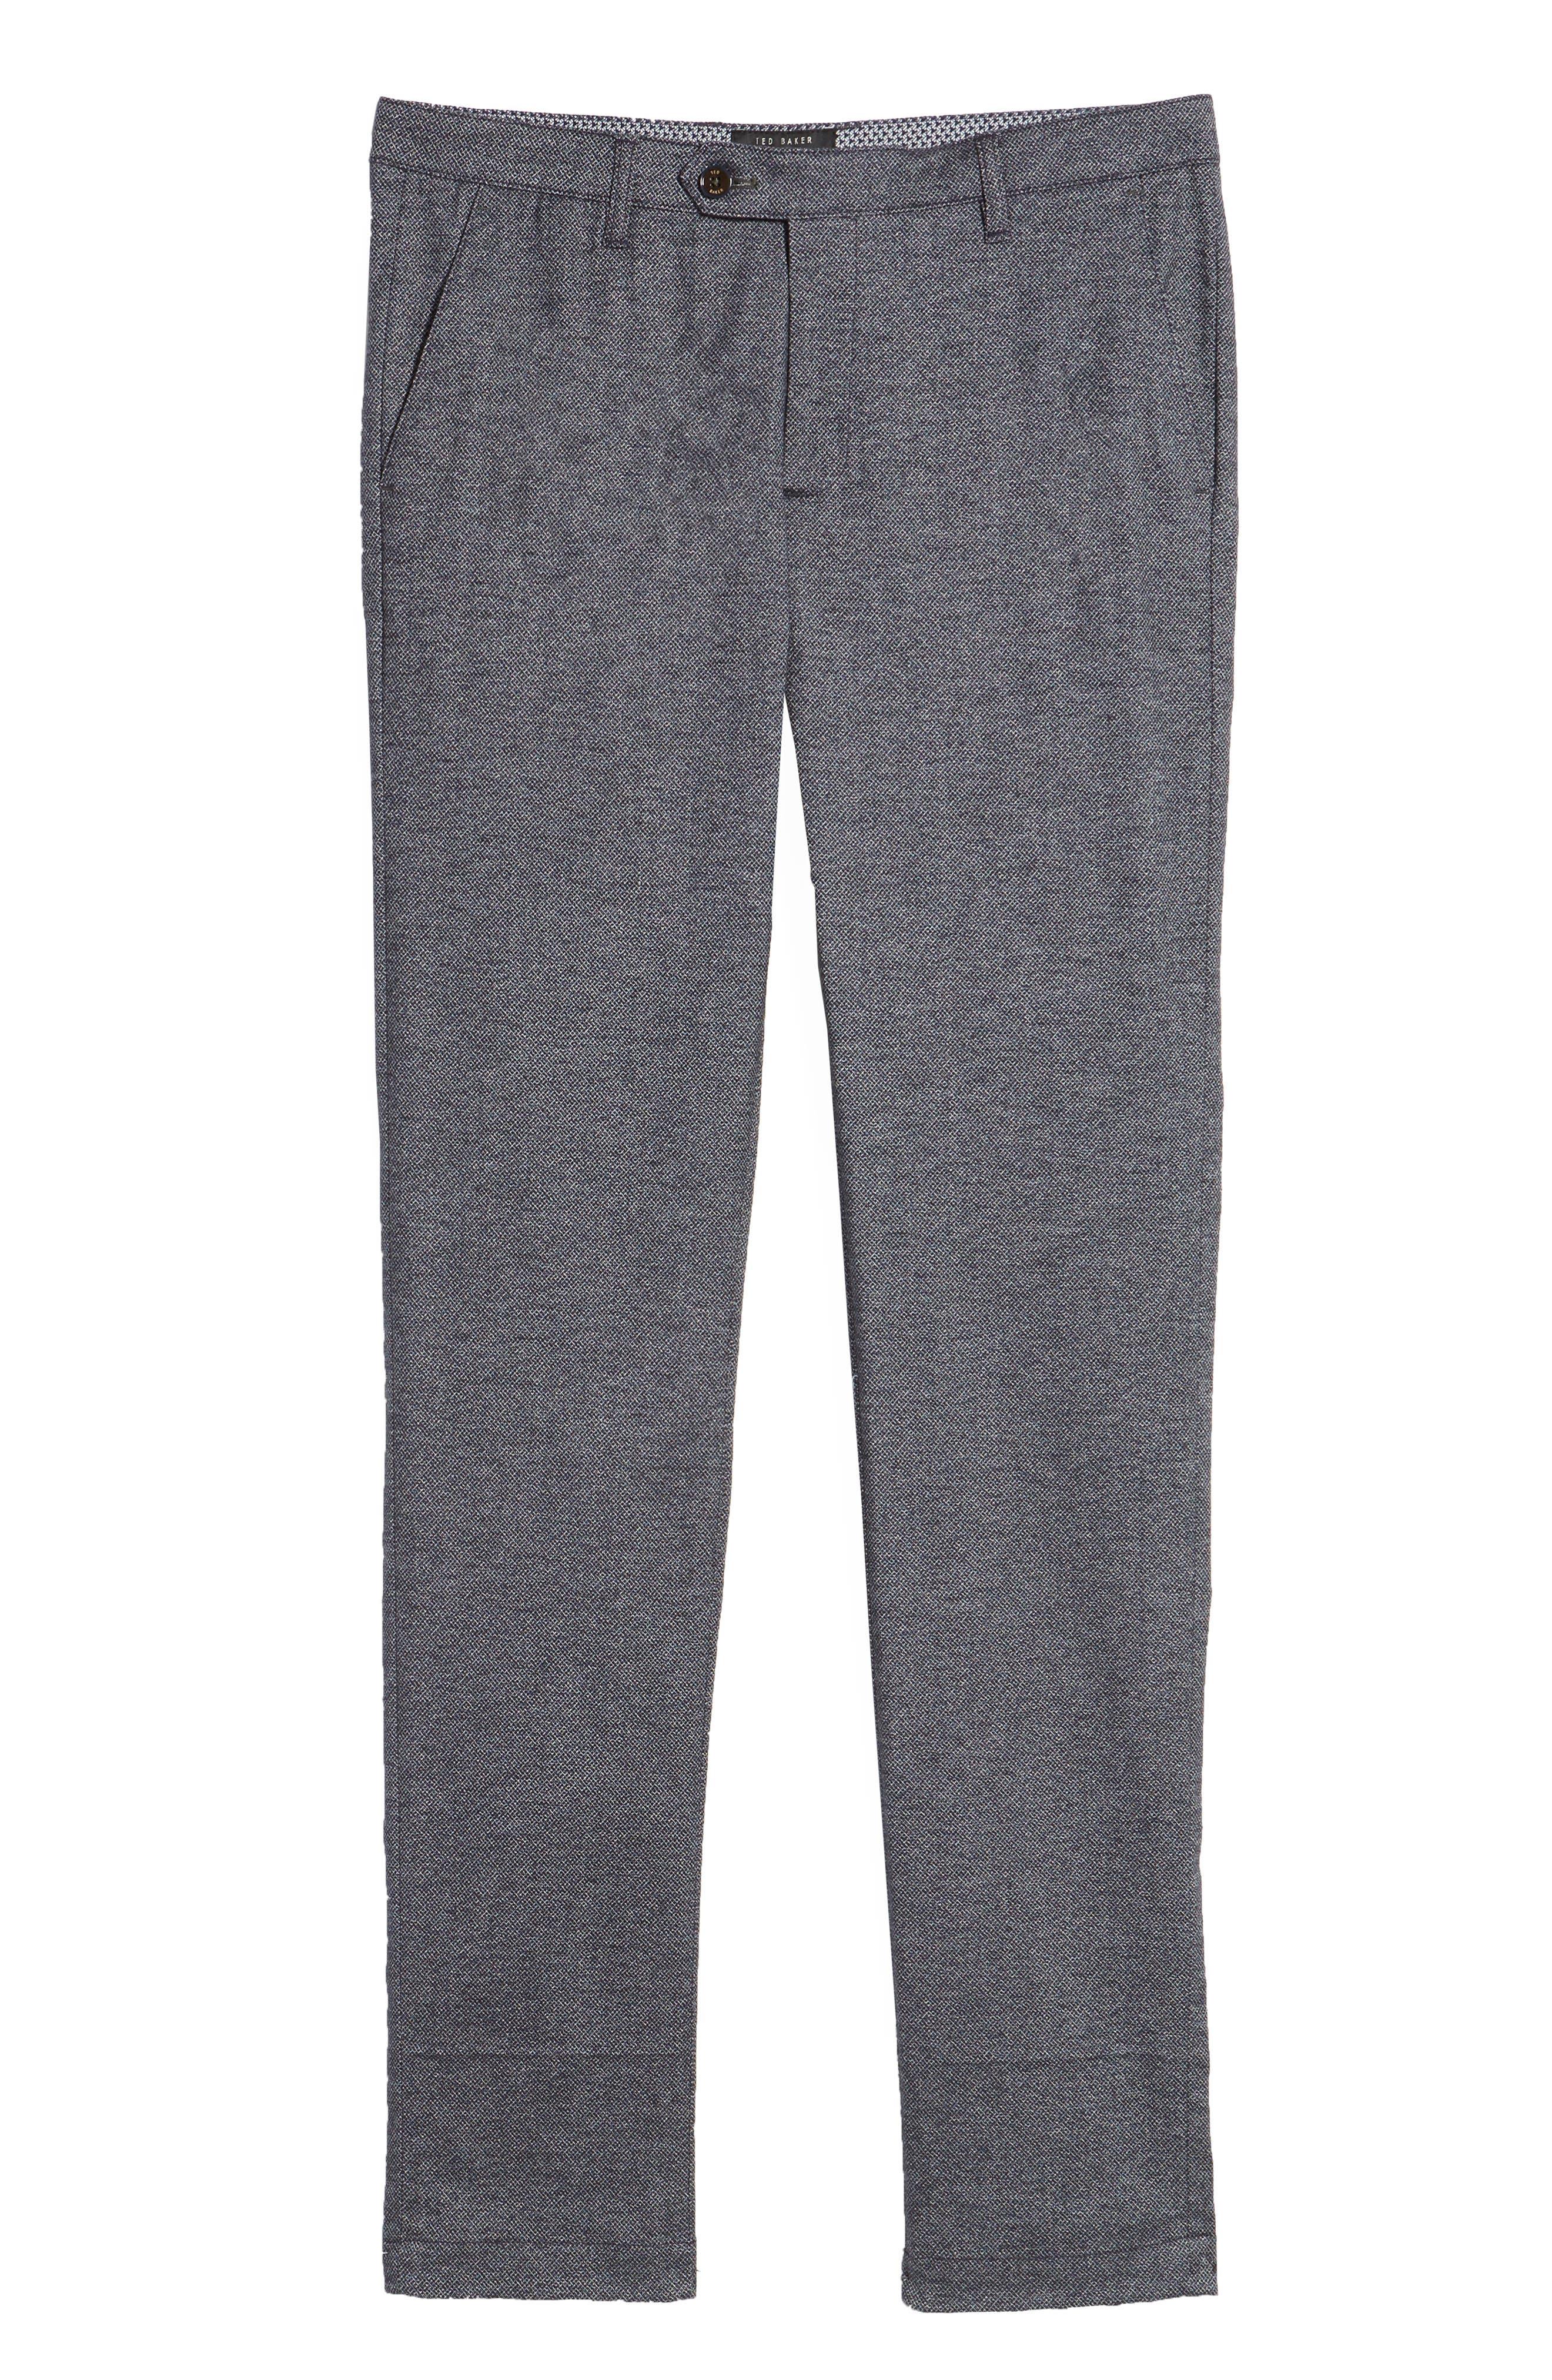 Pintztt Flat Front Stretch Solid Cotton Pants,                             Alternate thumbnail 6, color,                             Navy